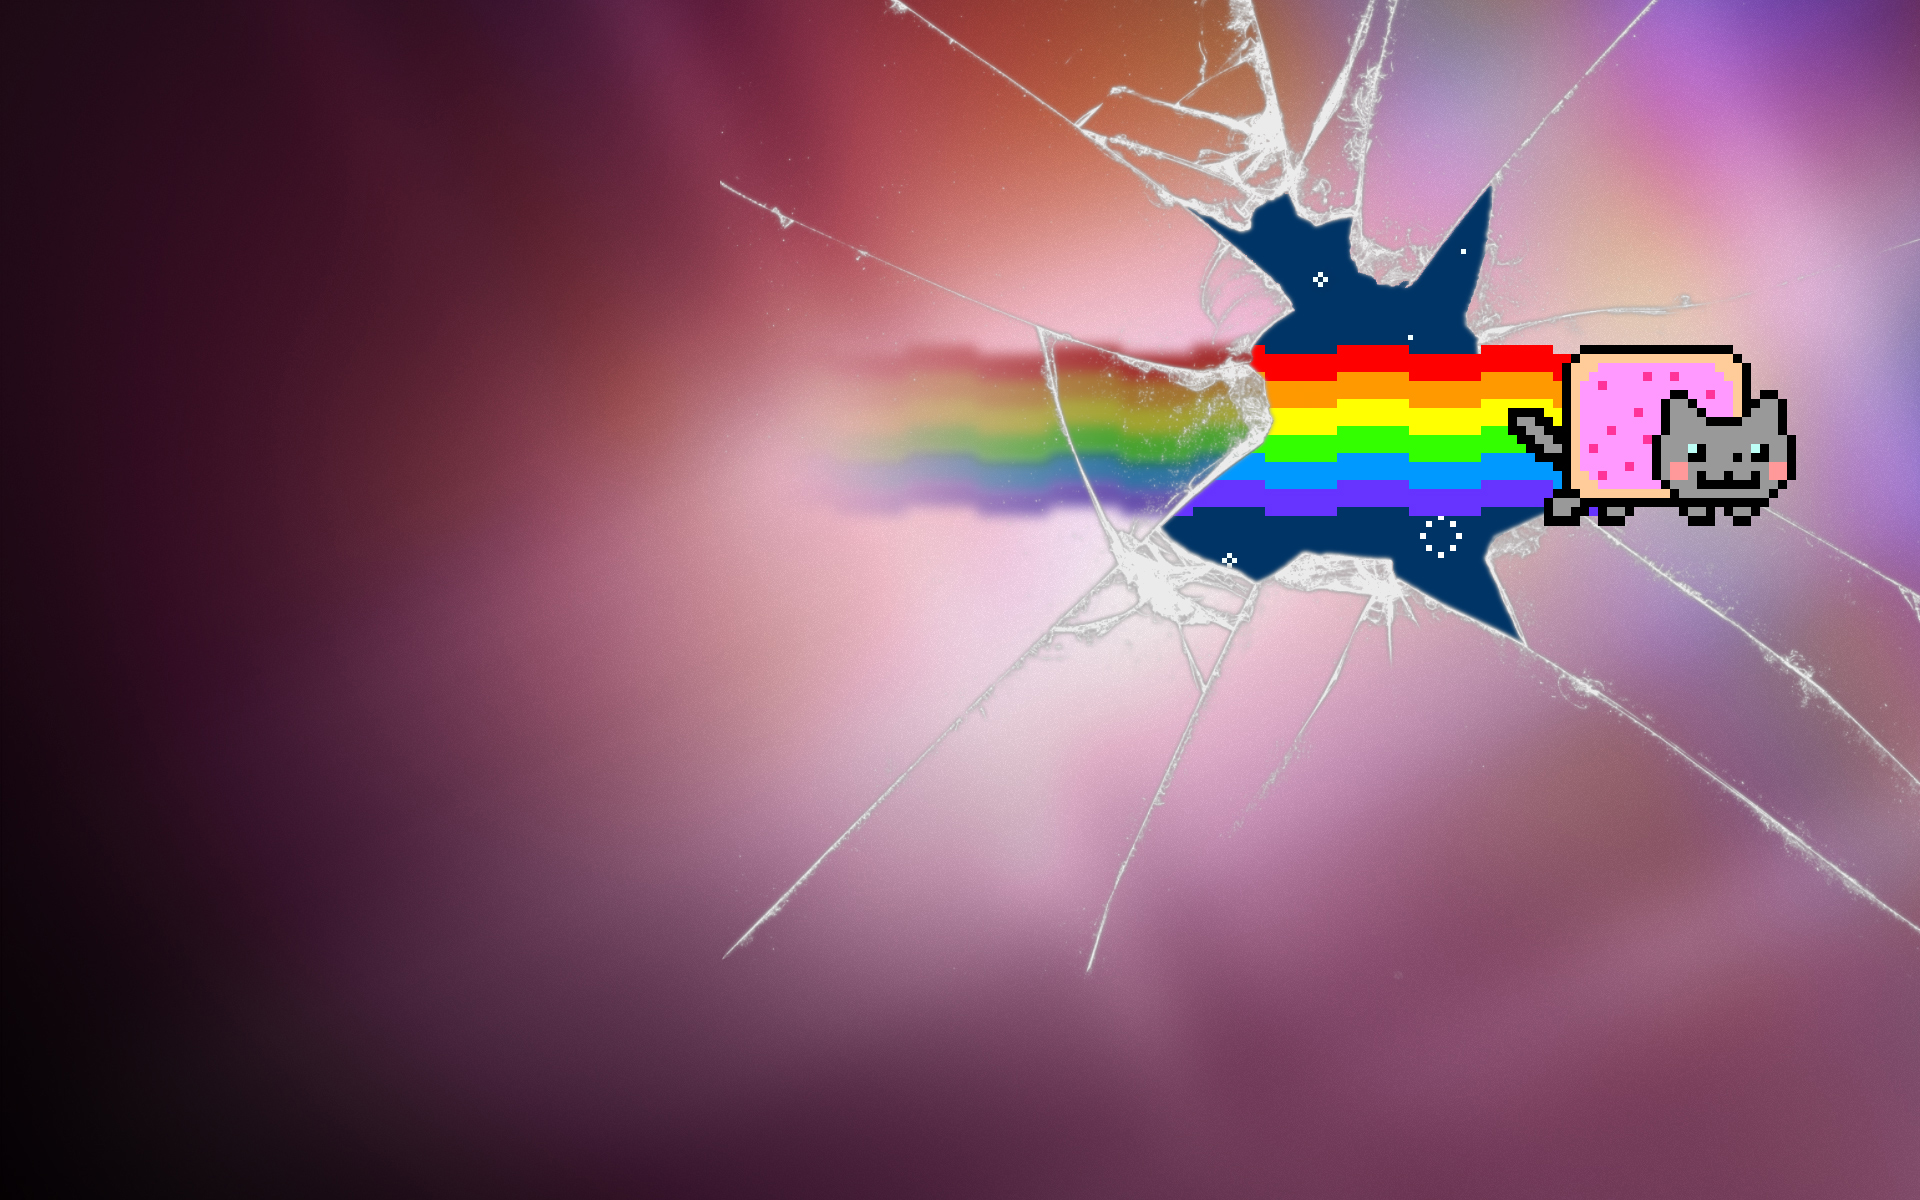 rainbow cat wallpapers - photo #5